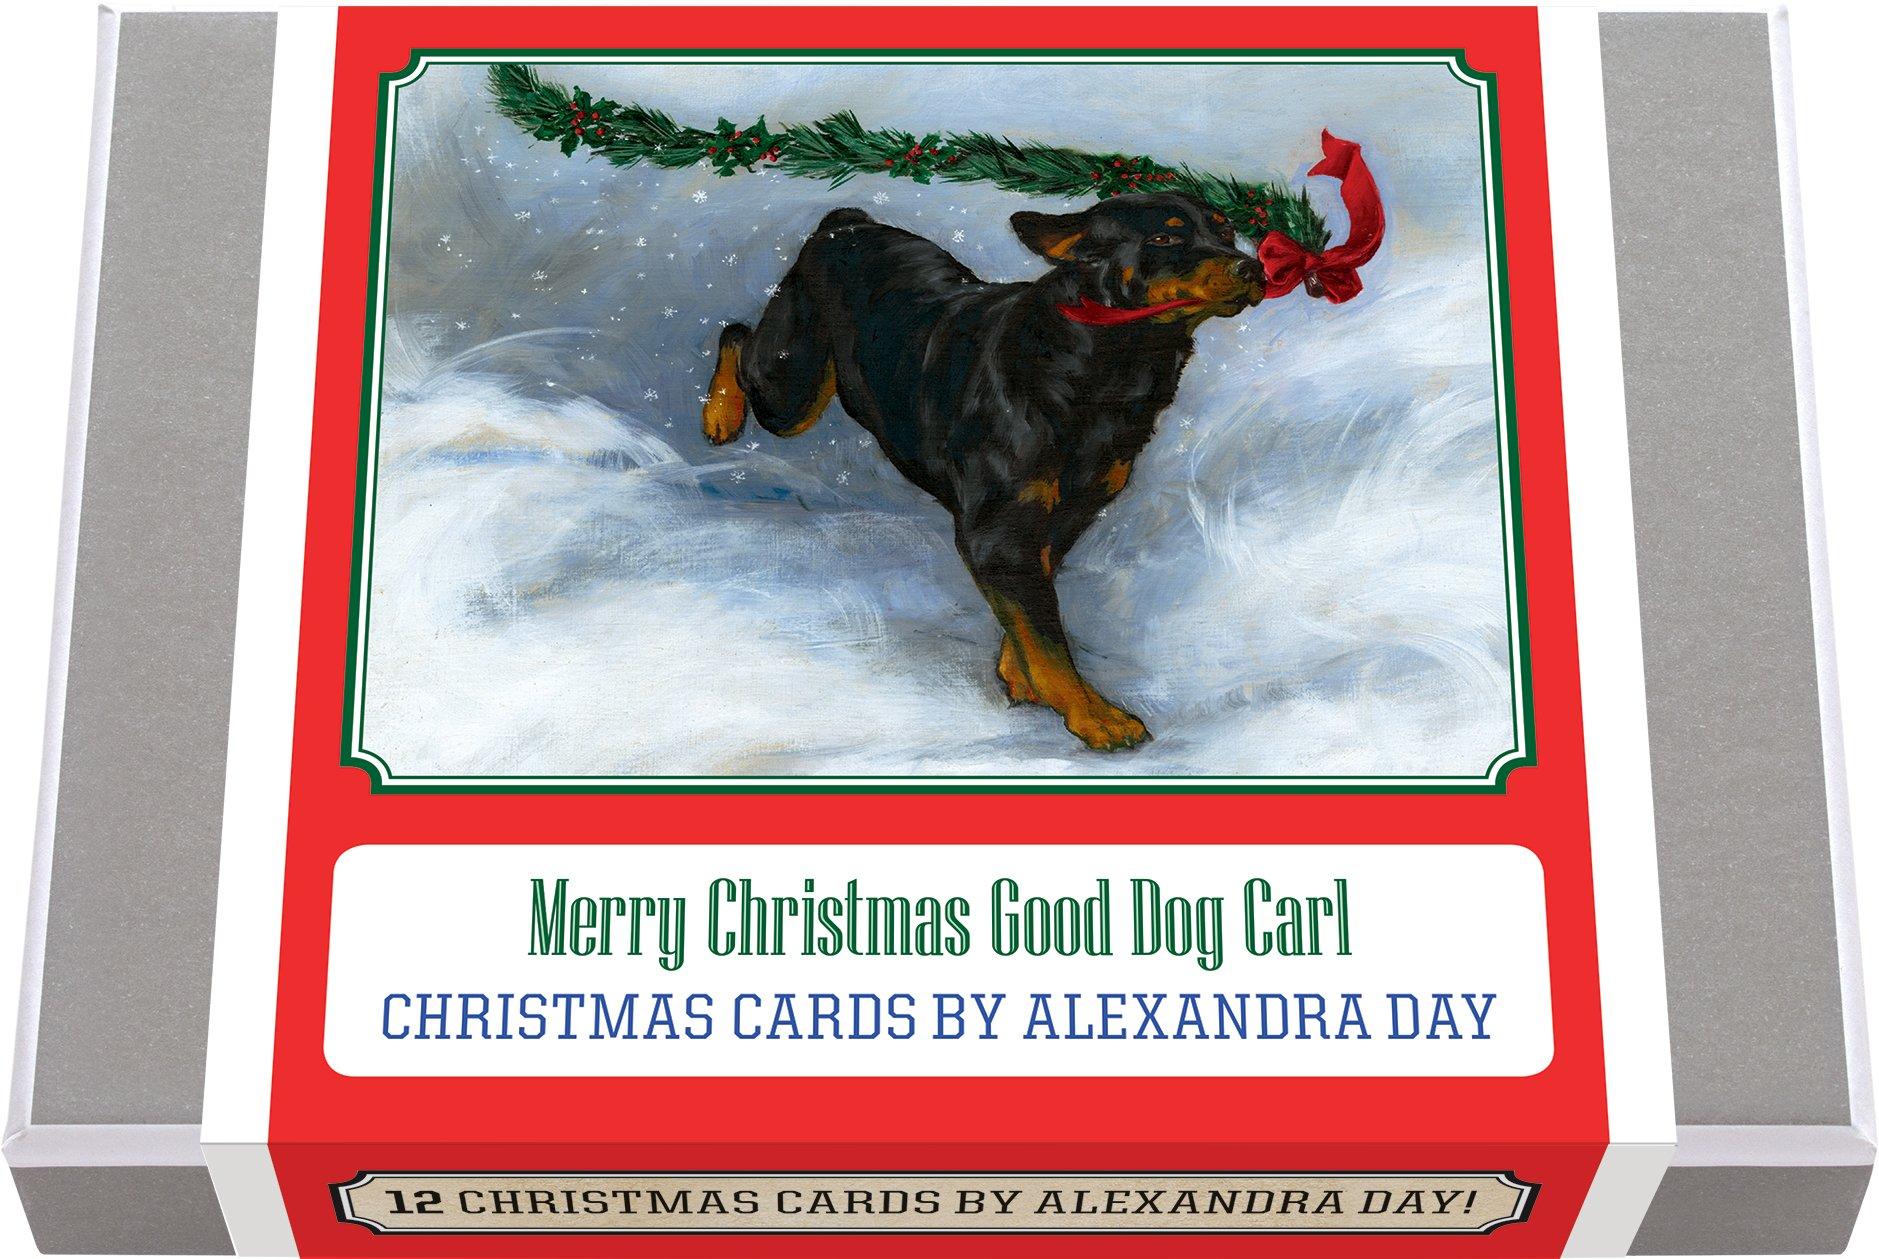 Merry Christmas Good Dog Carl - Christmas Cards by Alexandra Day ...